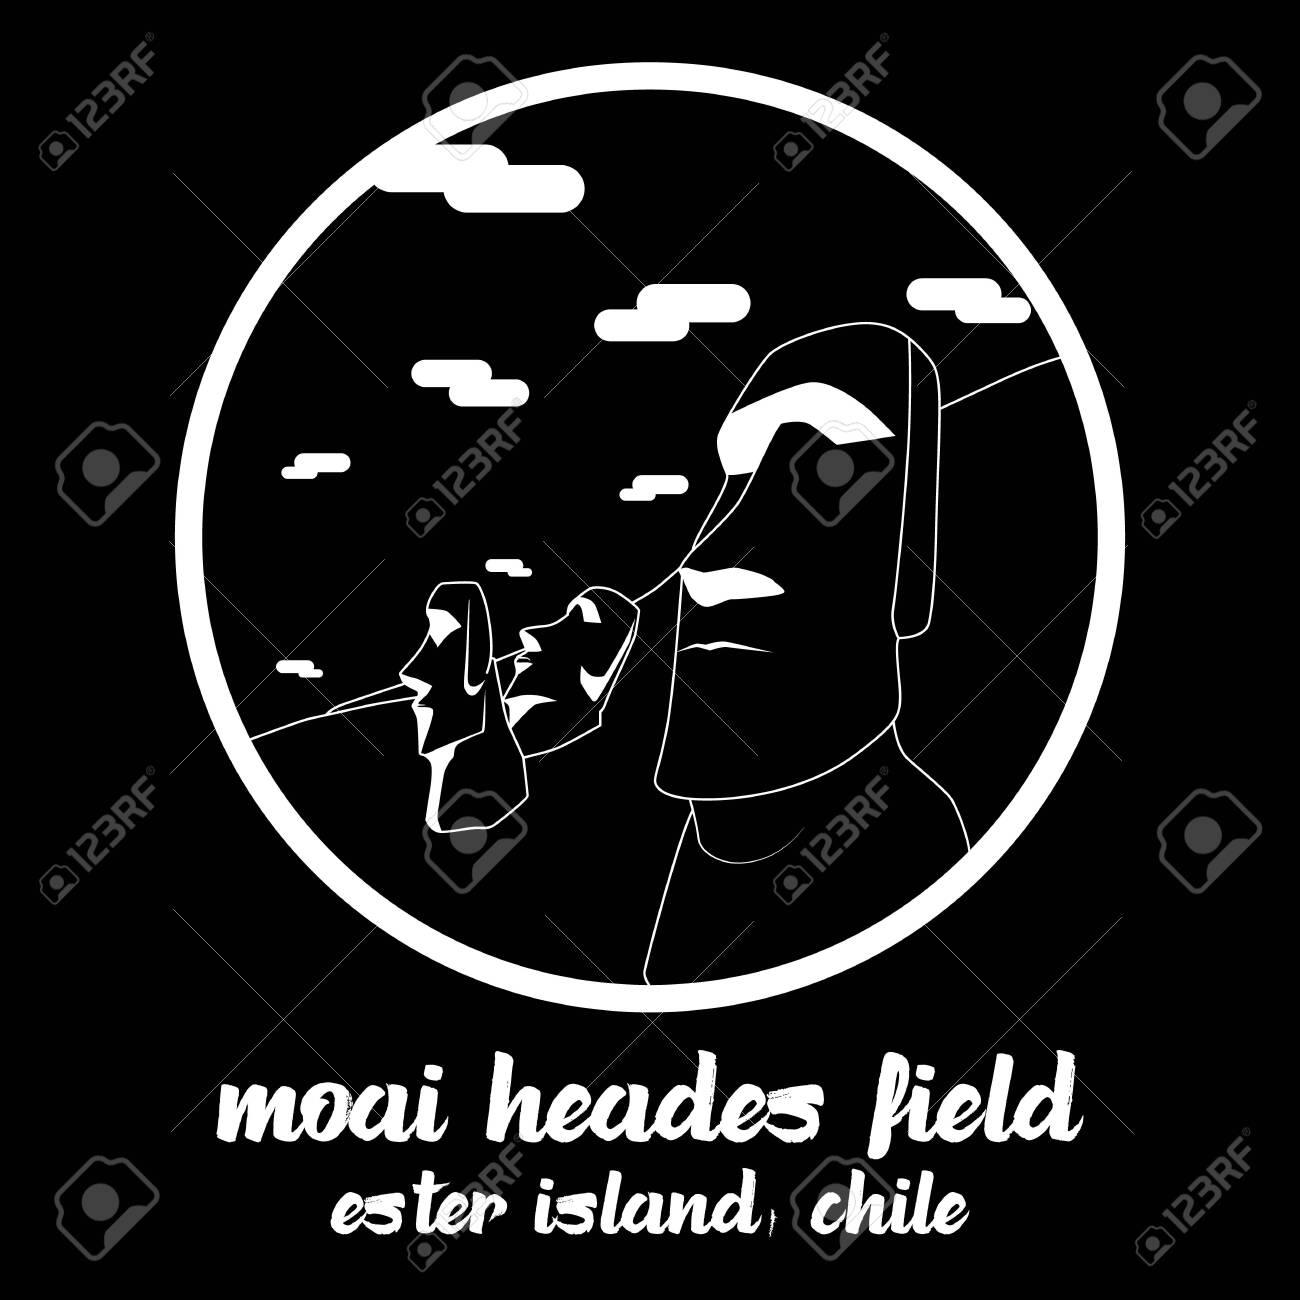 Circle icon line Moai Heades Field. vector illustration - 133311208